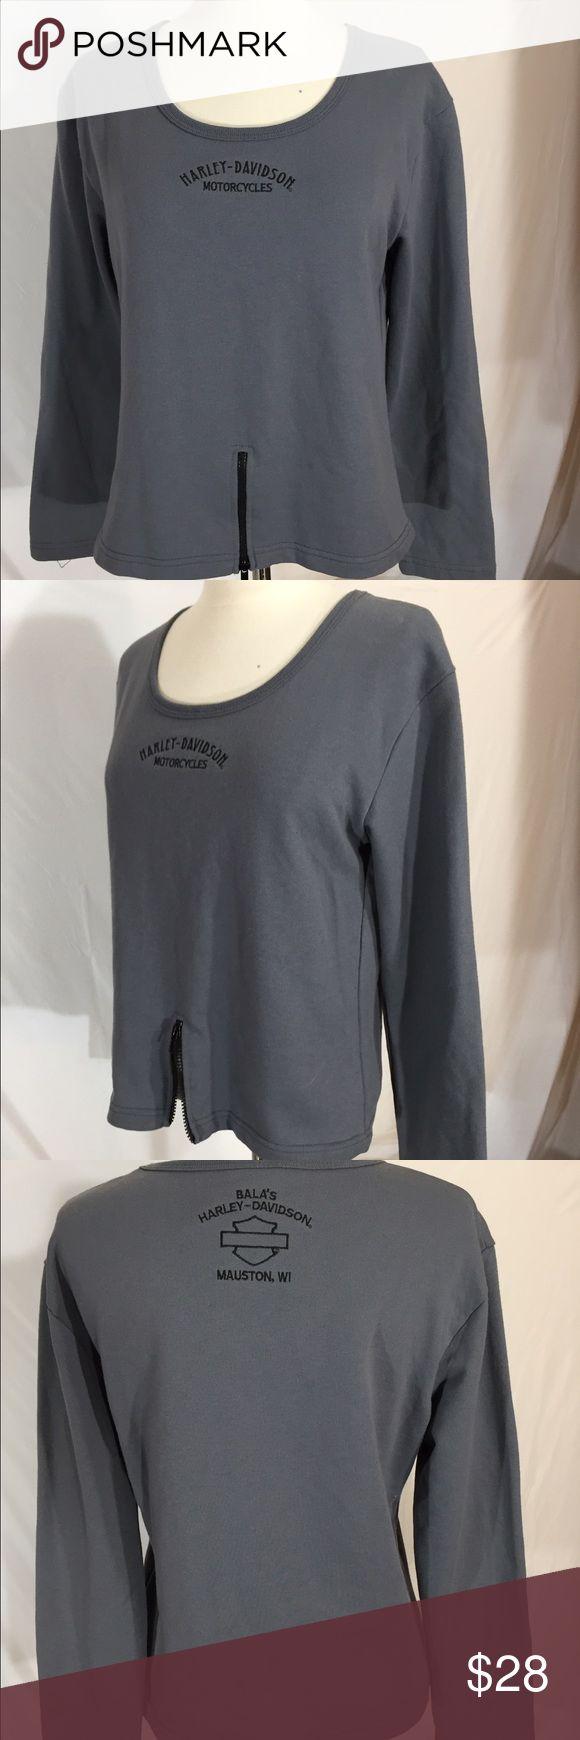 Women's Harley Davidson Sweatshirt Sz XL Excellent condition Harley-Davidson Tops Sweatshirts & Hoodies